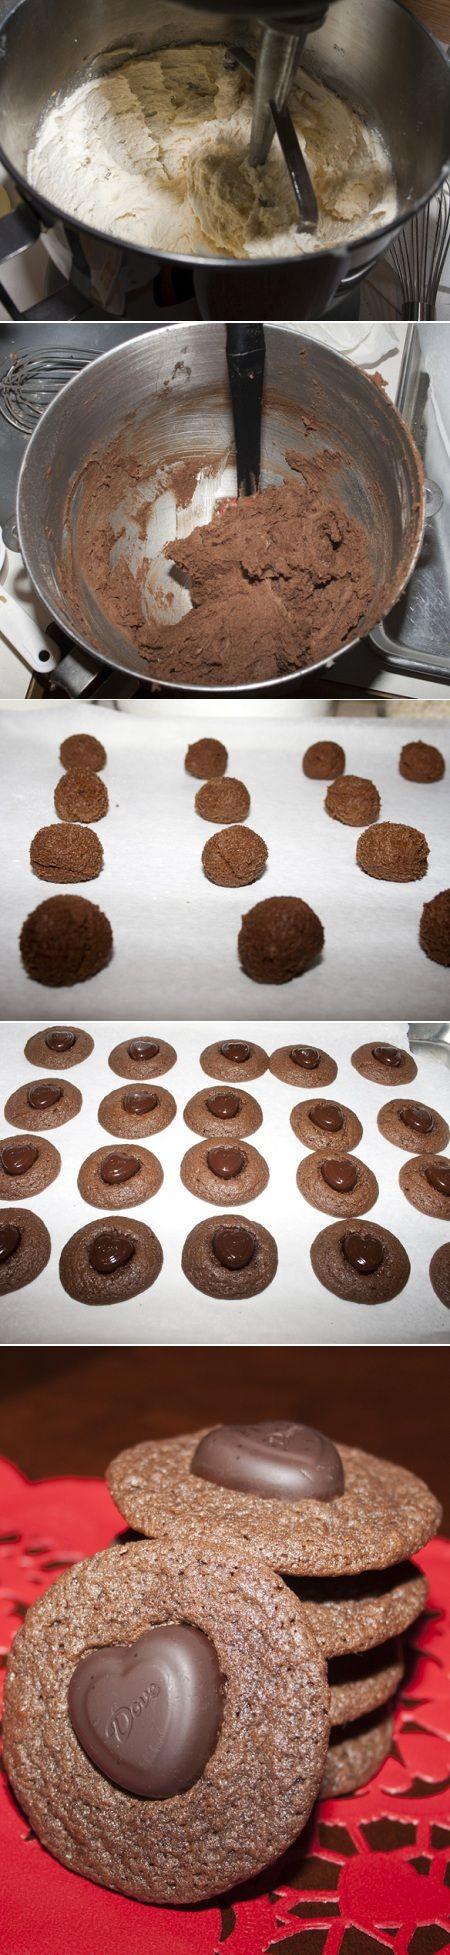 Dark Chocolate Chocolate Cookies